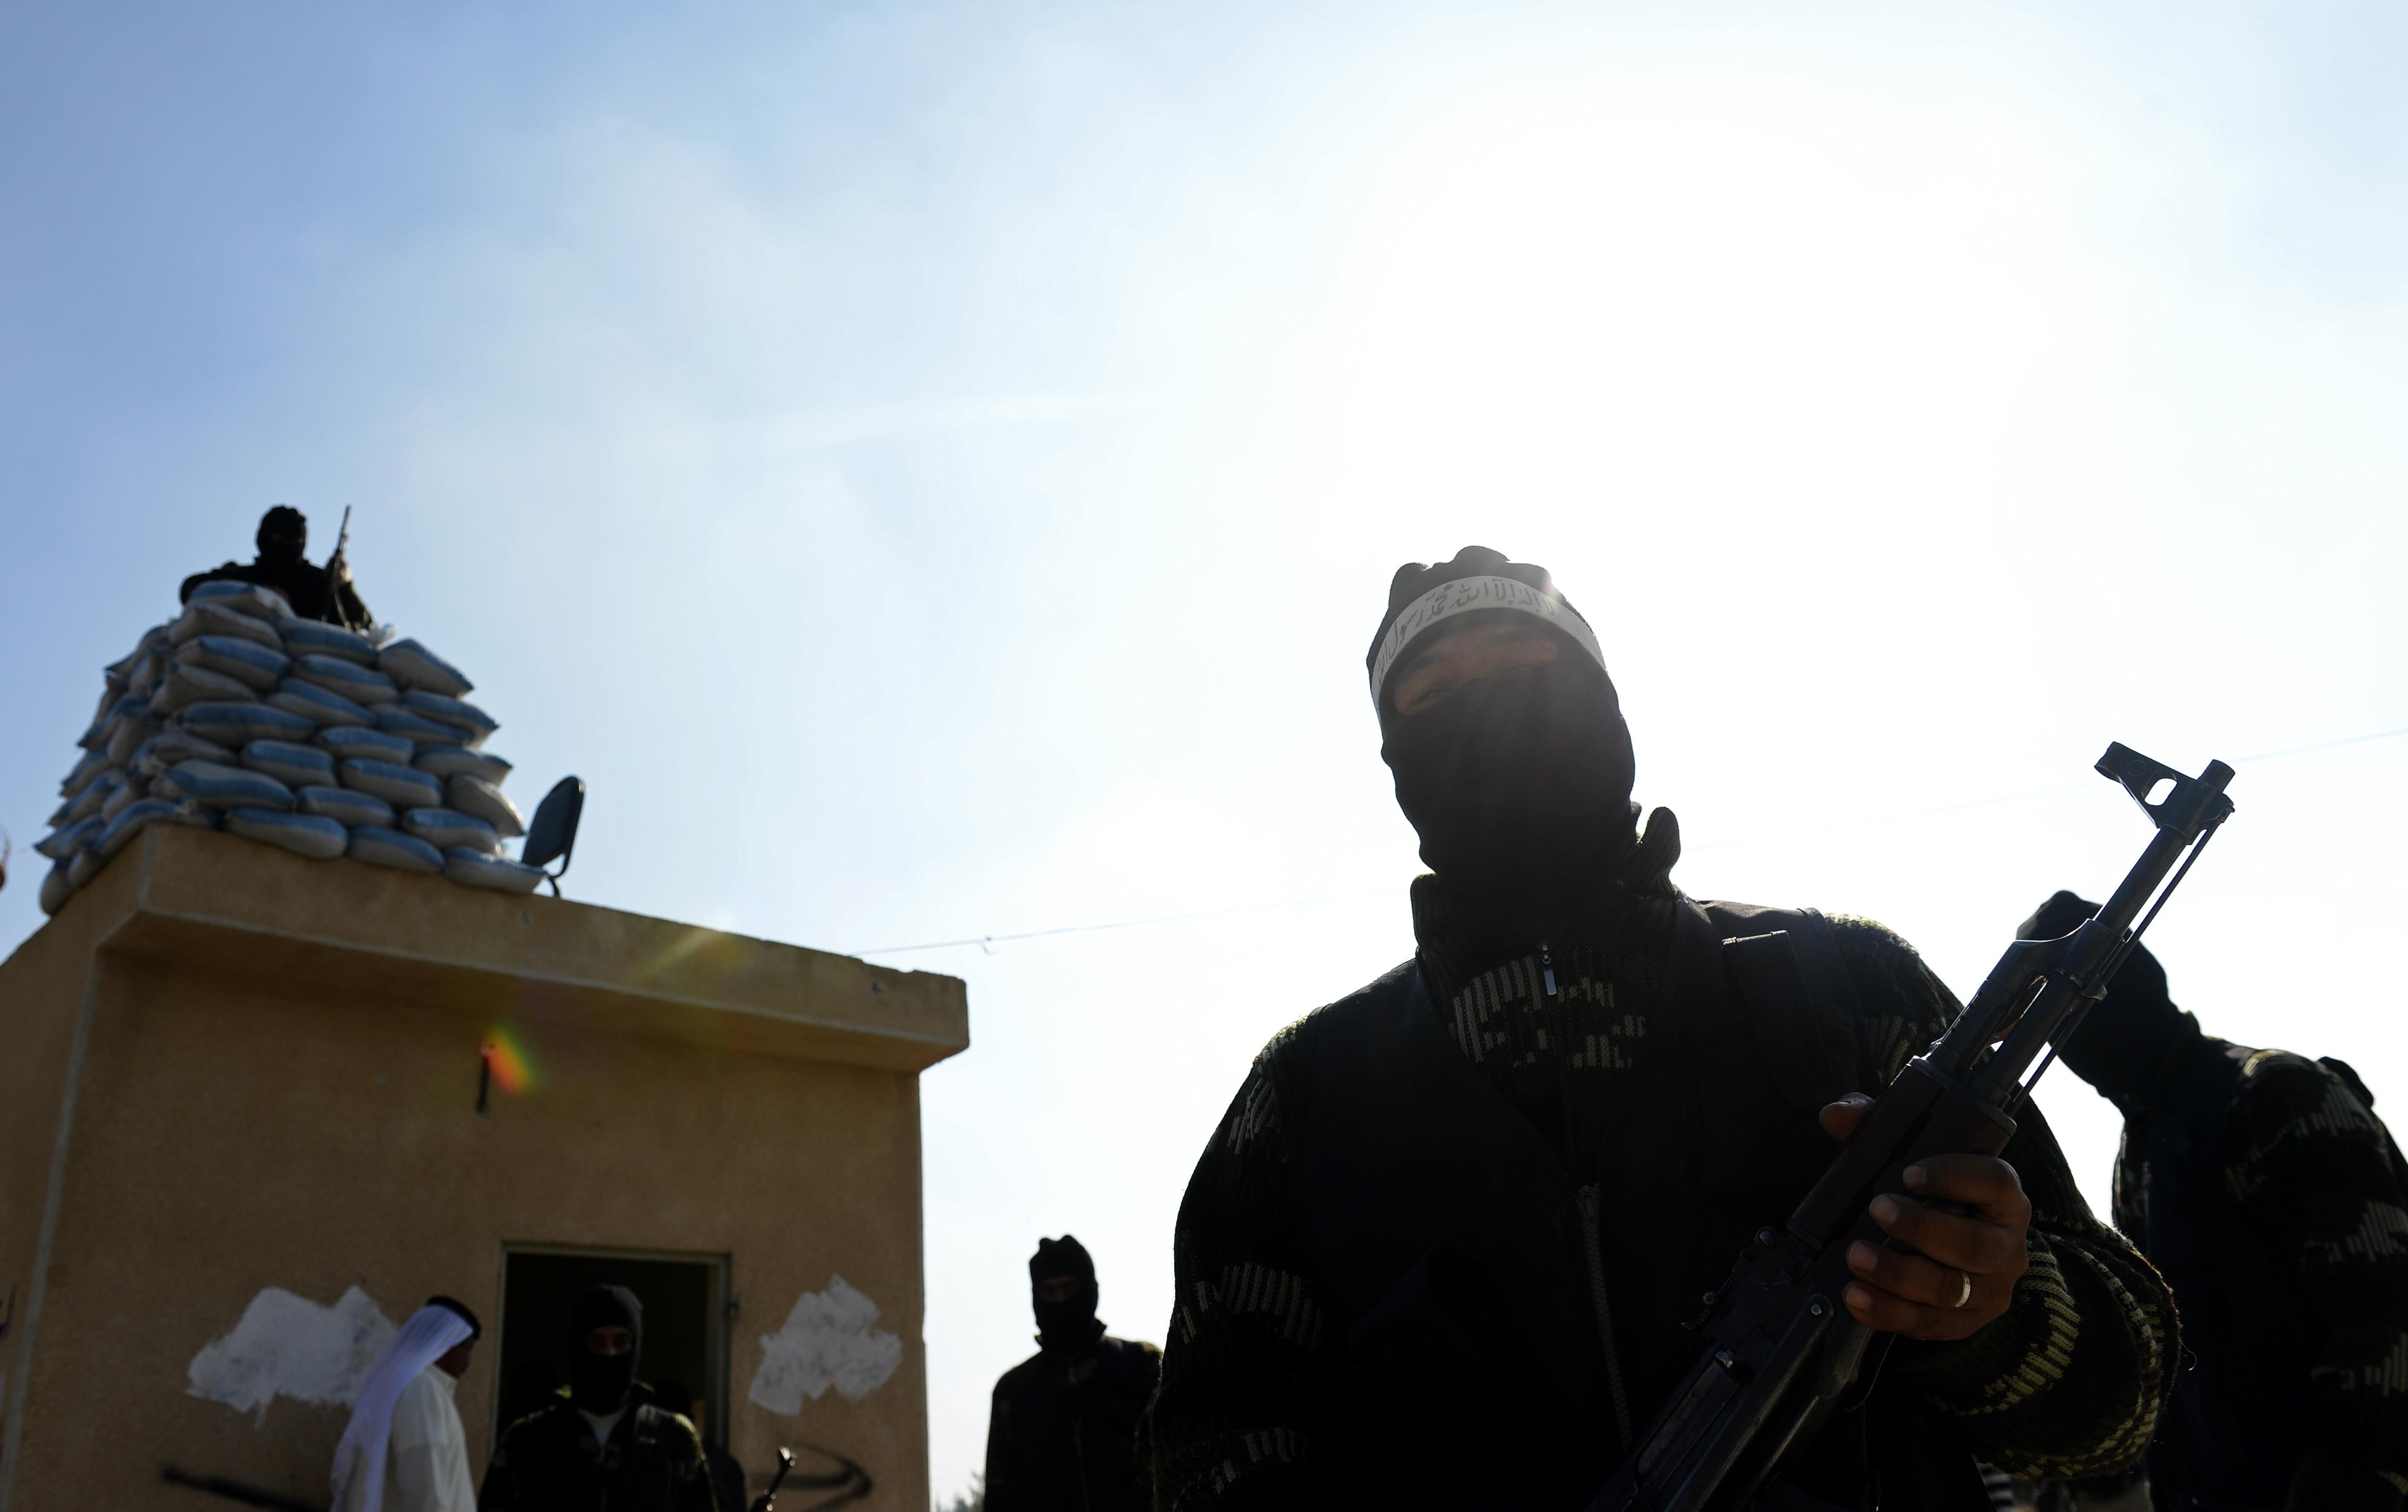 Власти Сирии ликвидировали у себя чеченских террористов